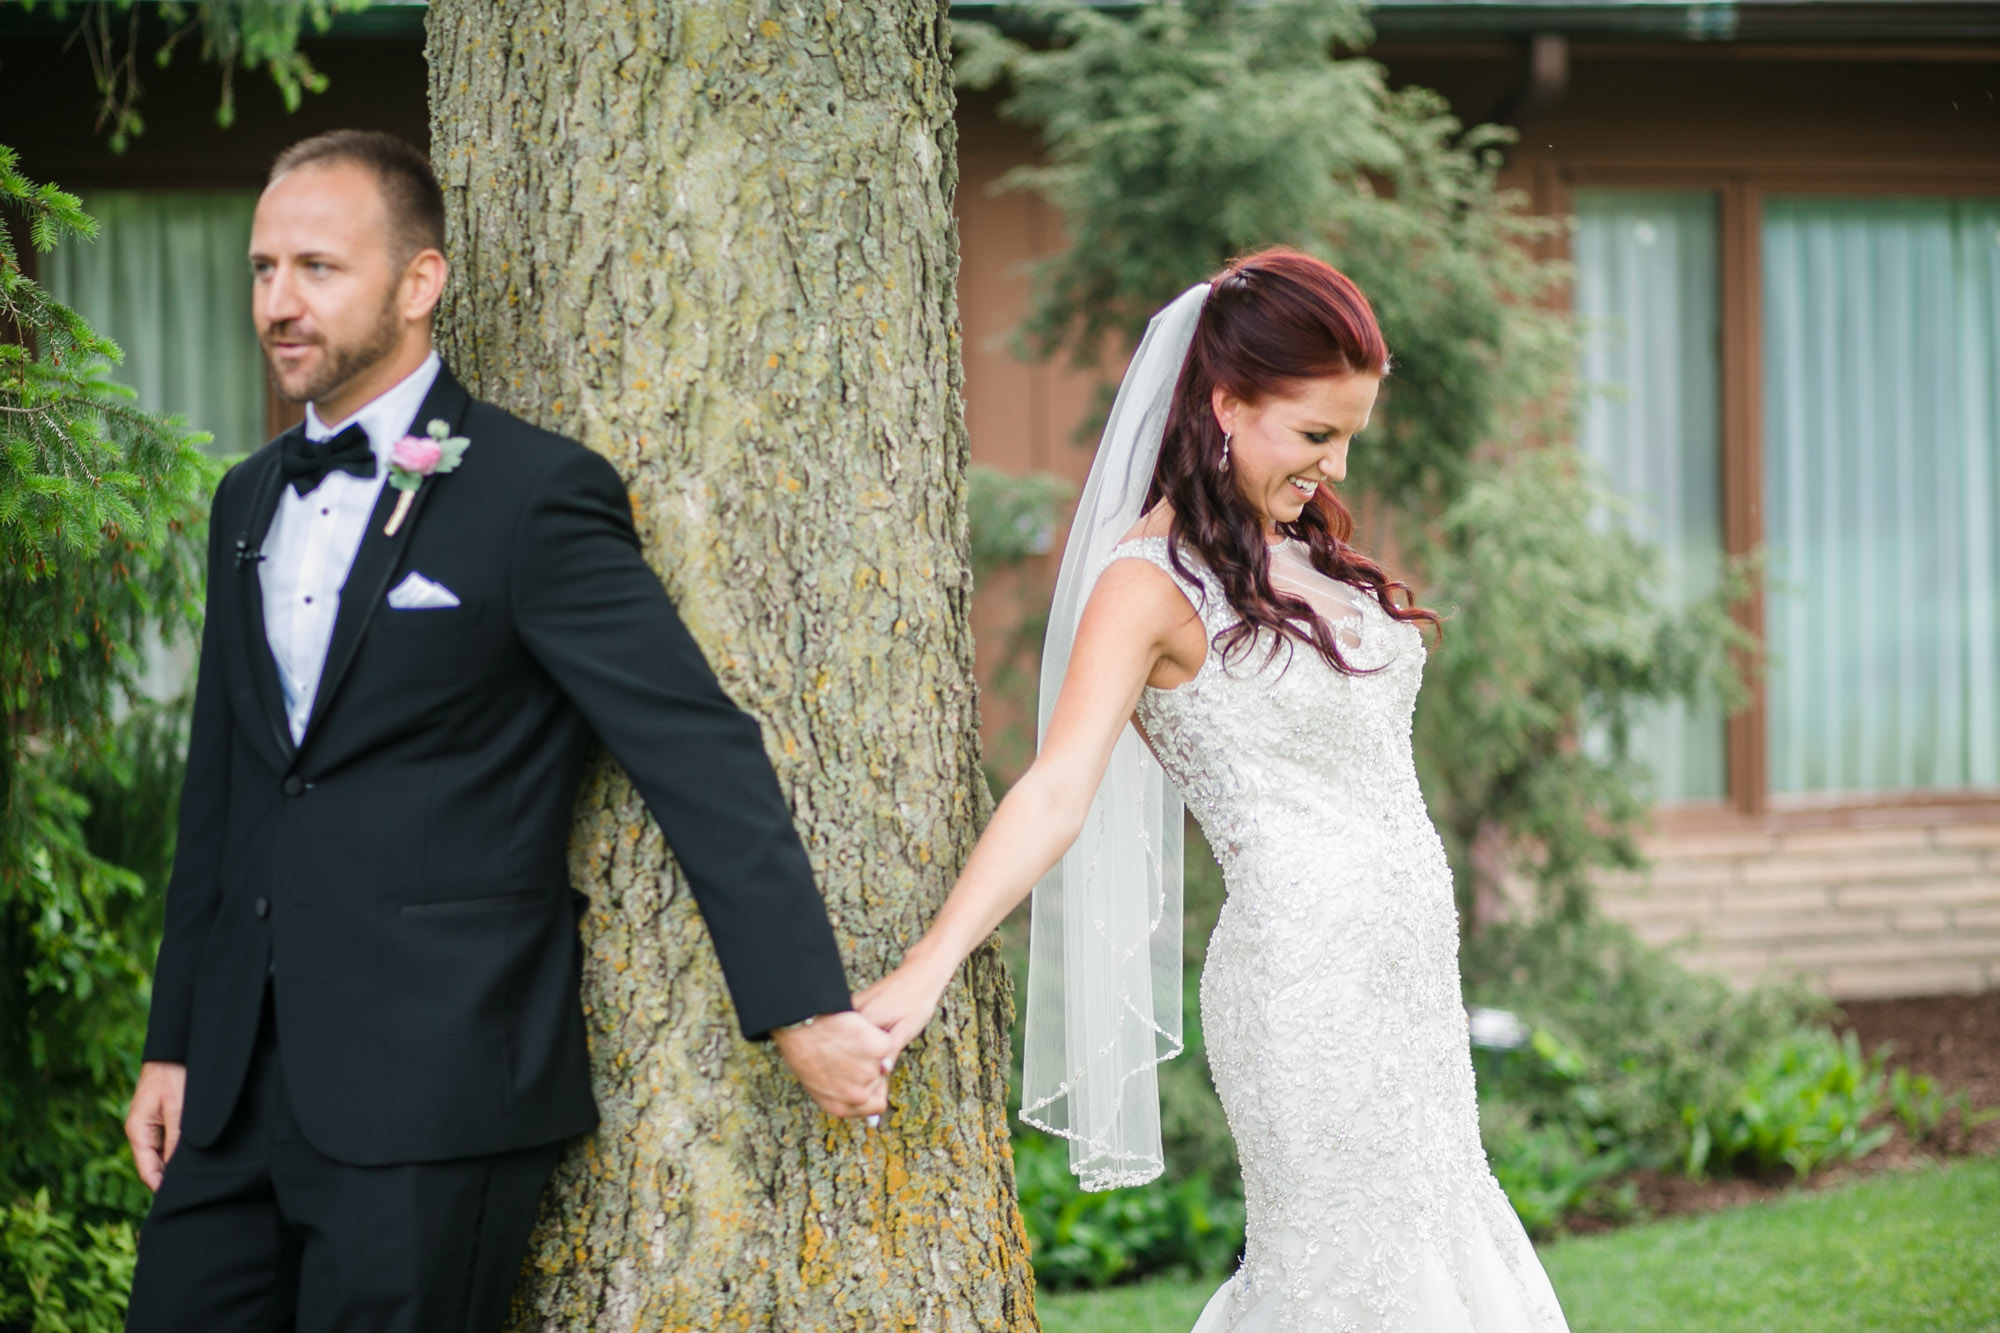 hensville-wedding-downtown-toledo-ohio (21 of 103).jpg